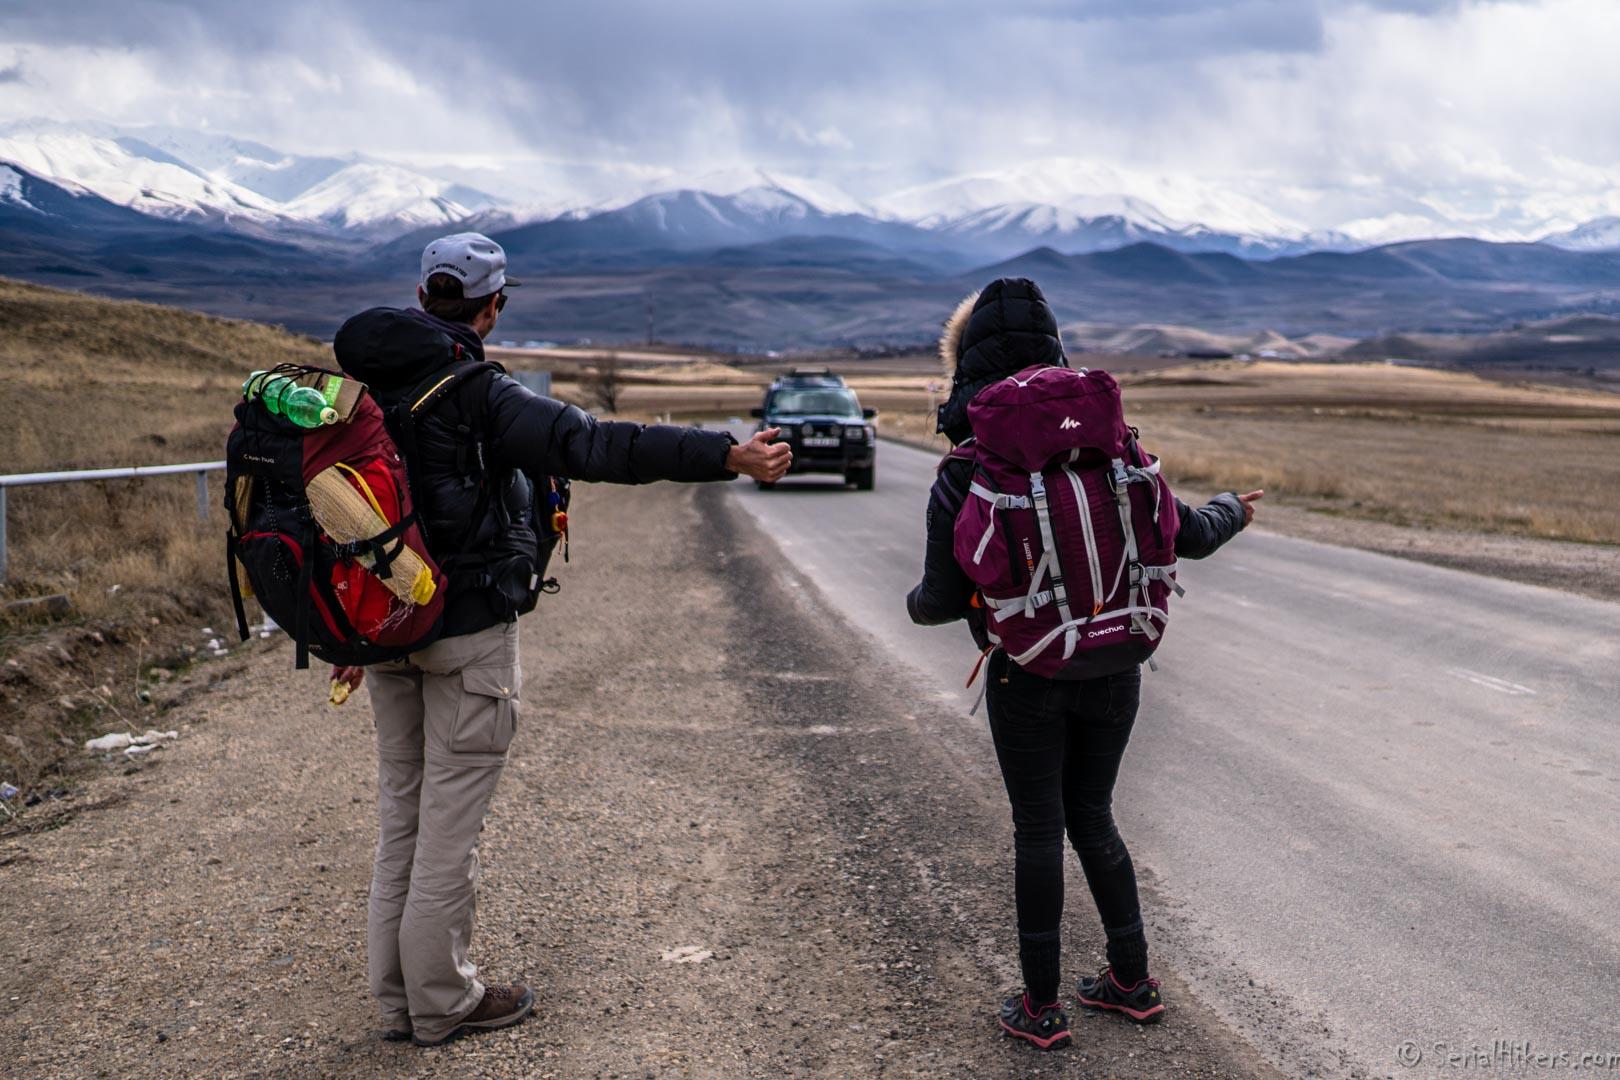 SerialHikers stop autostop world monde tour hitchhiking aventure adventure alternative travel voyage sans avion no fly caucase armenia armenie